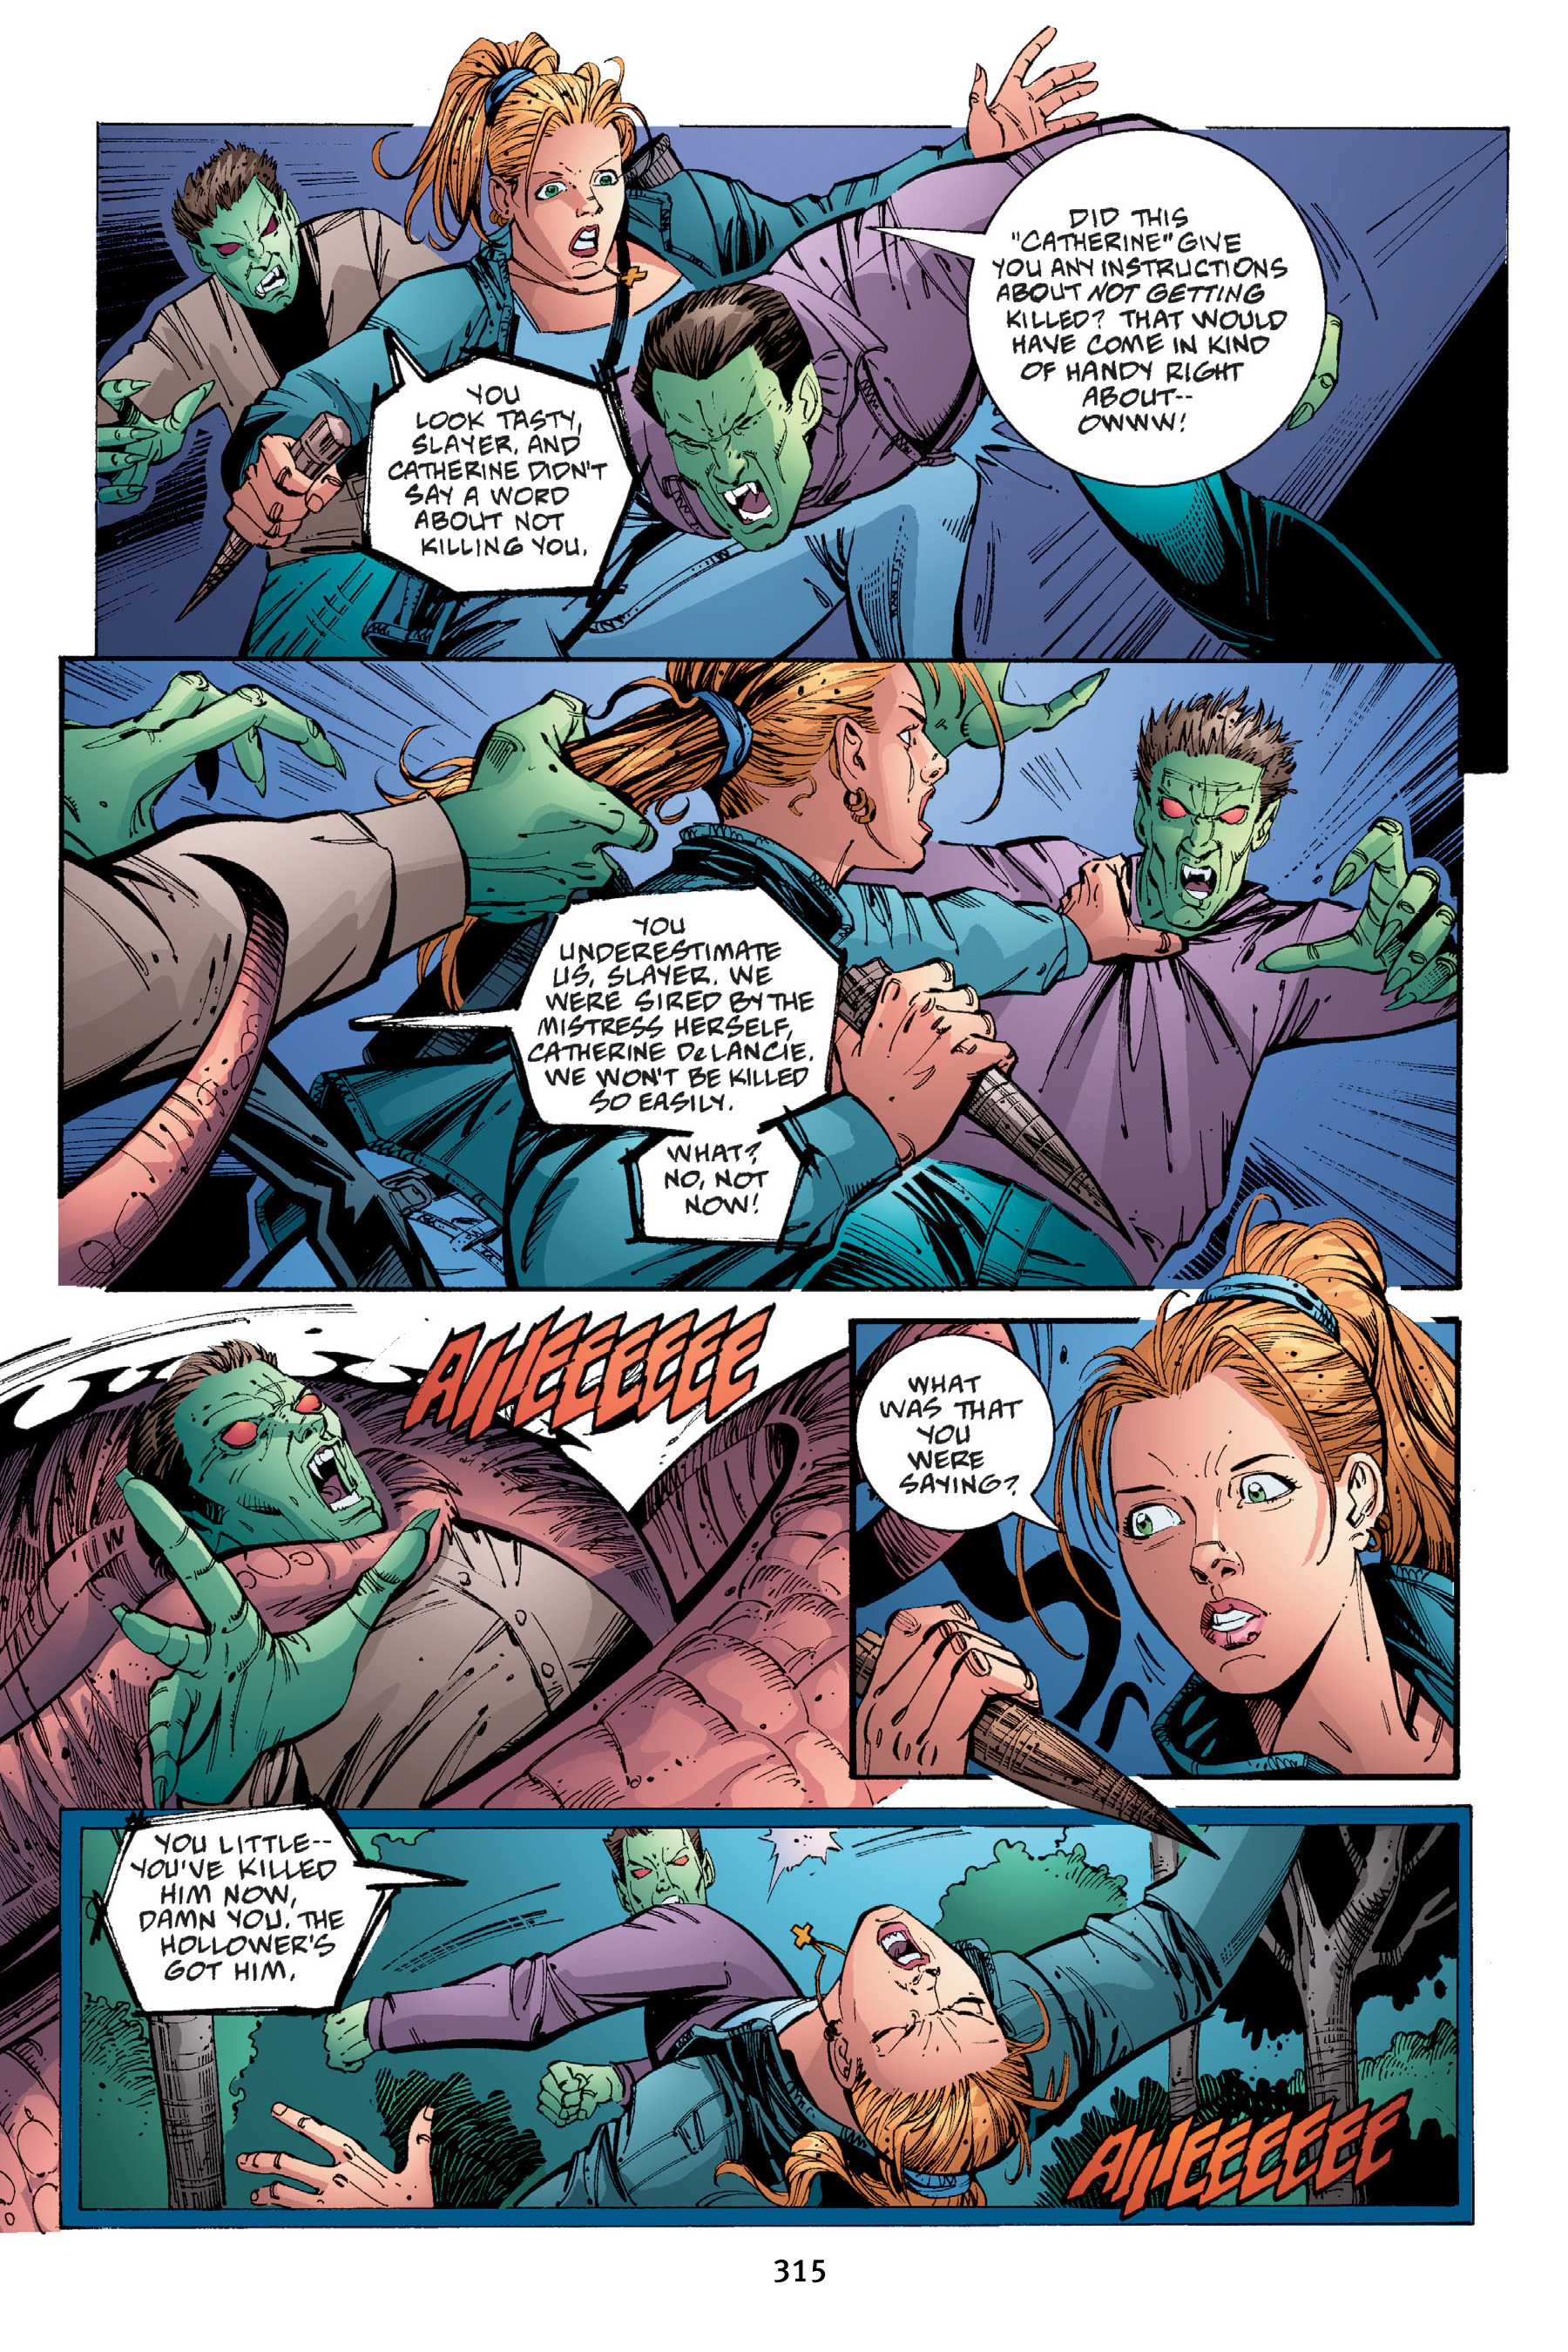 Read online Buffy the Vampire Slayer: Omnibus comic -  Issue # TPB 4 - 312